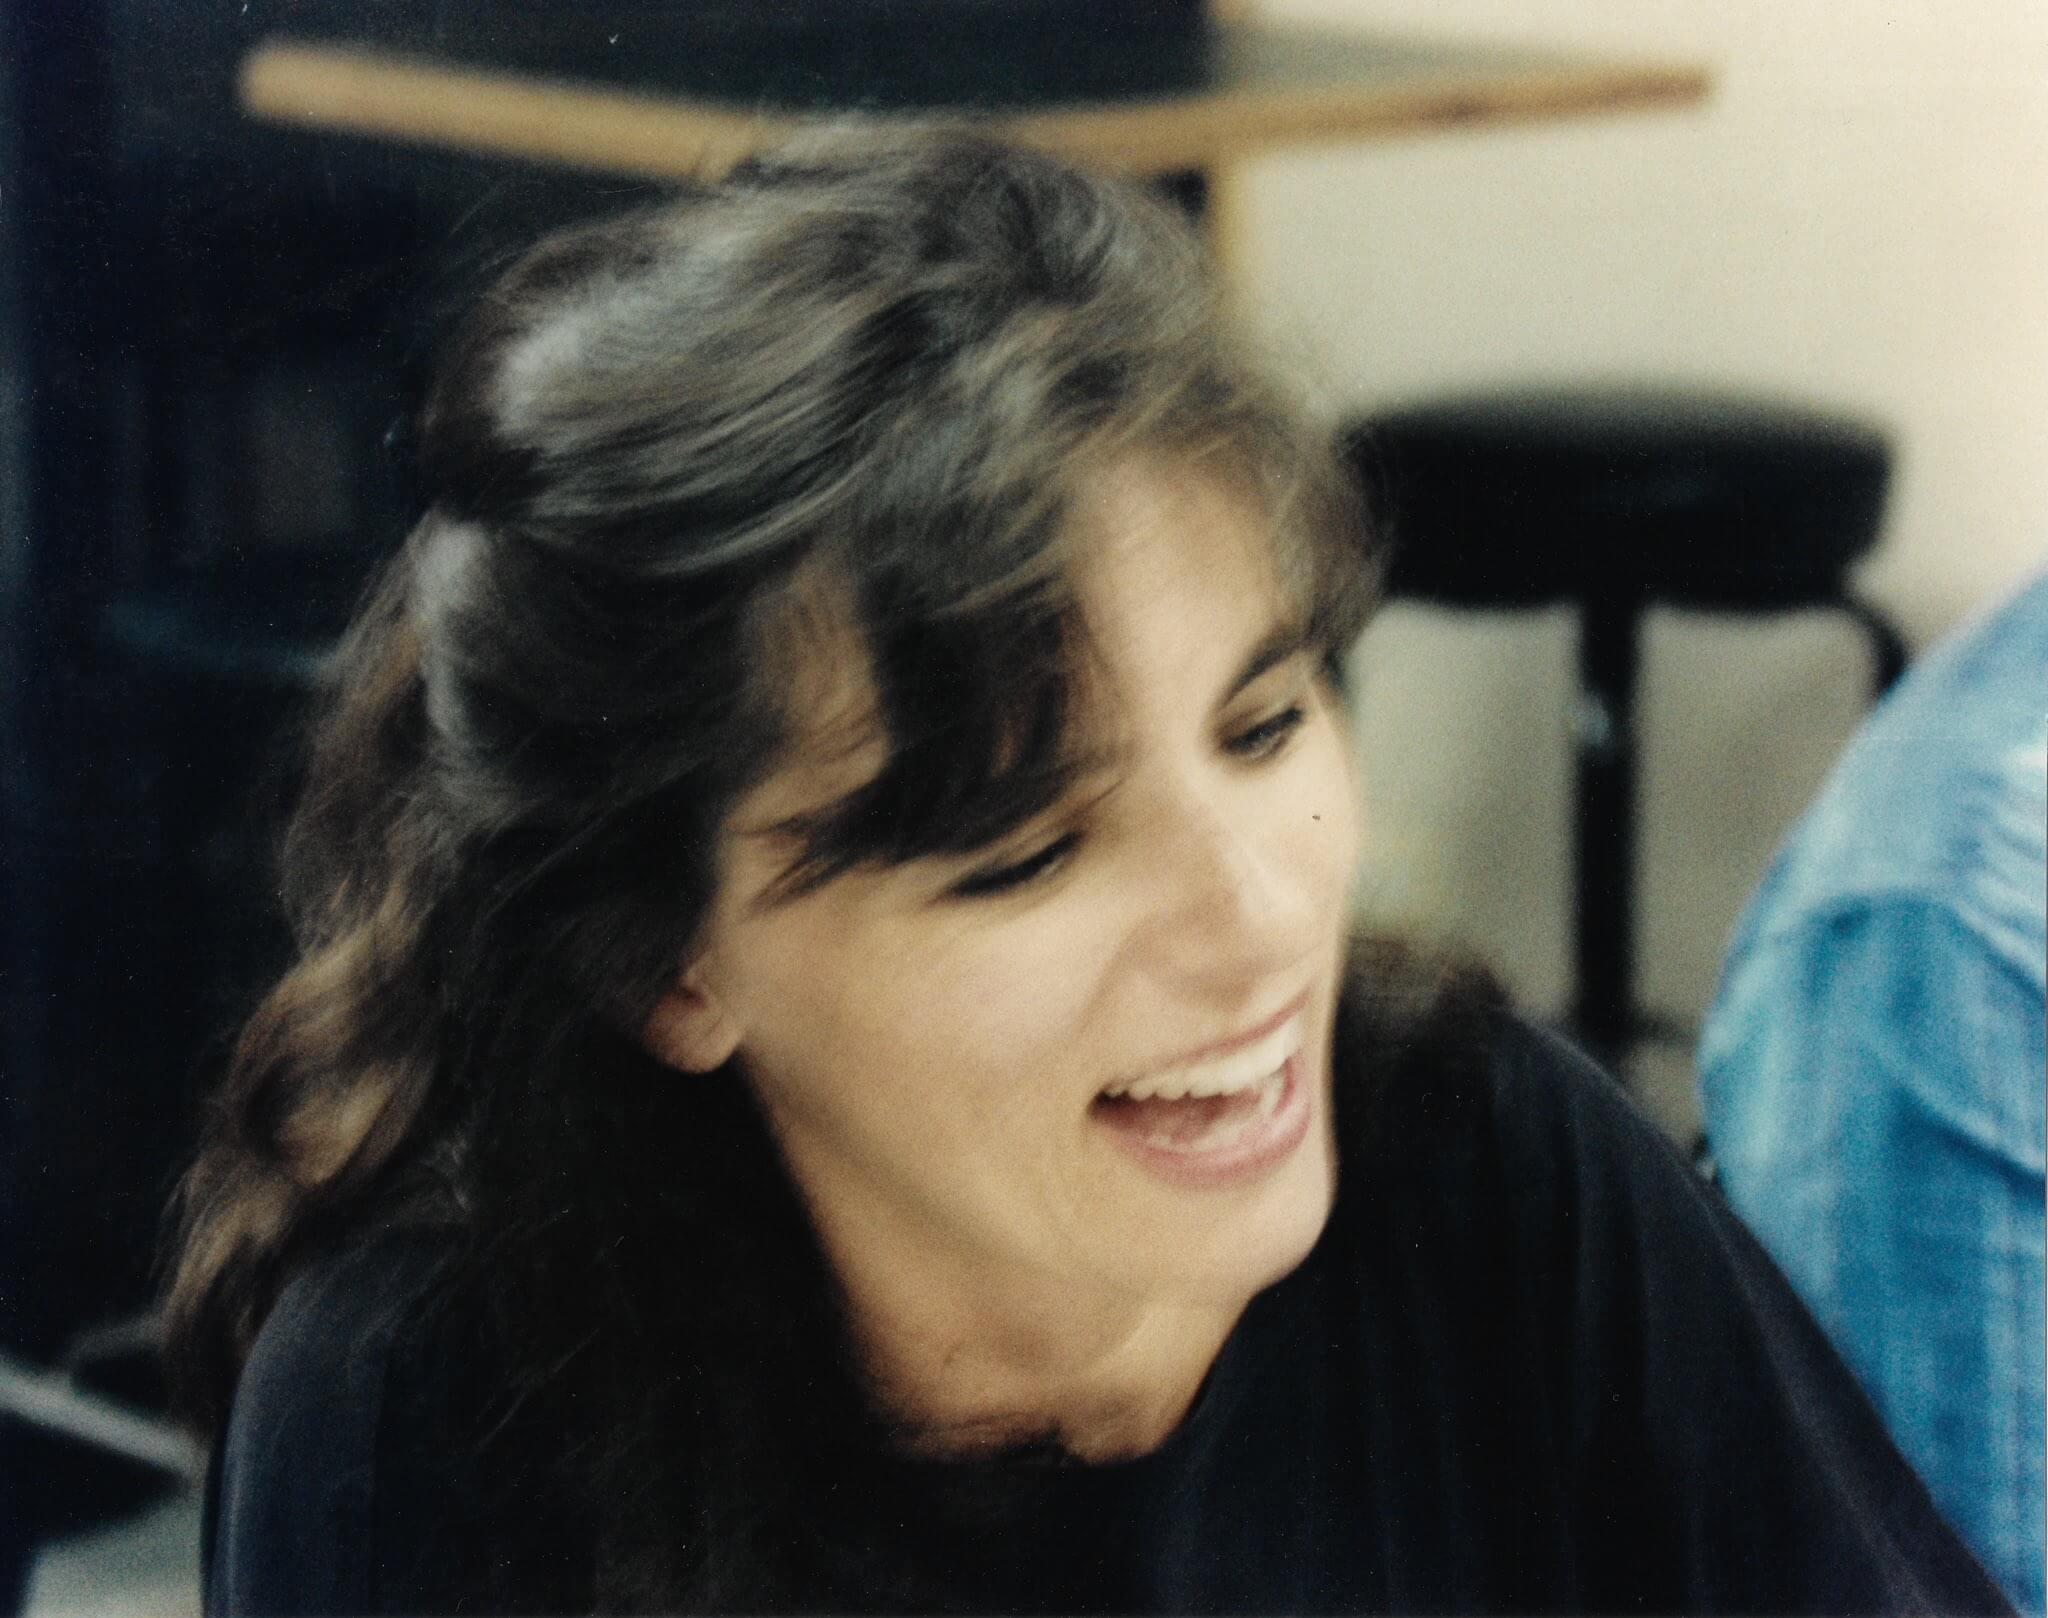 Legendarna glumica Mira Furlan preminula u 65. godini